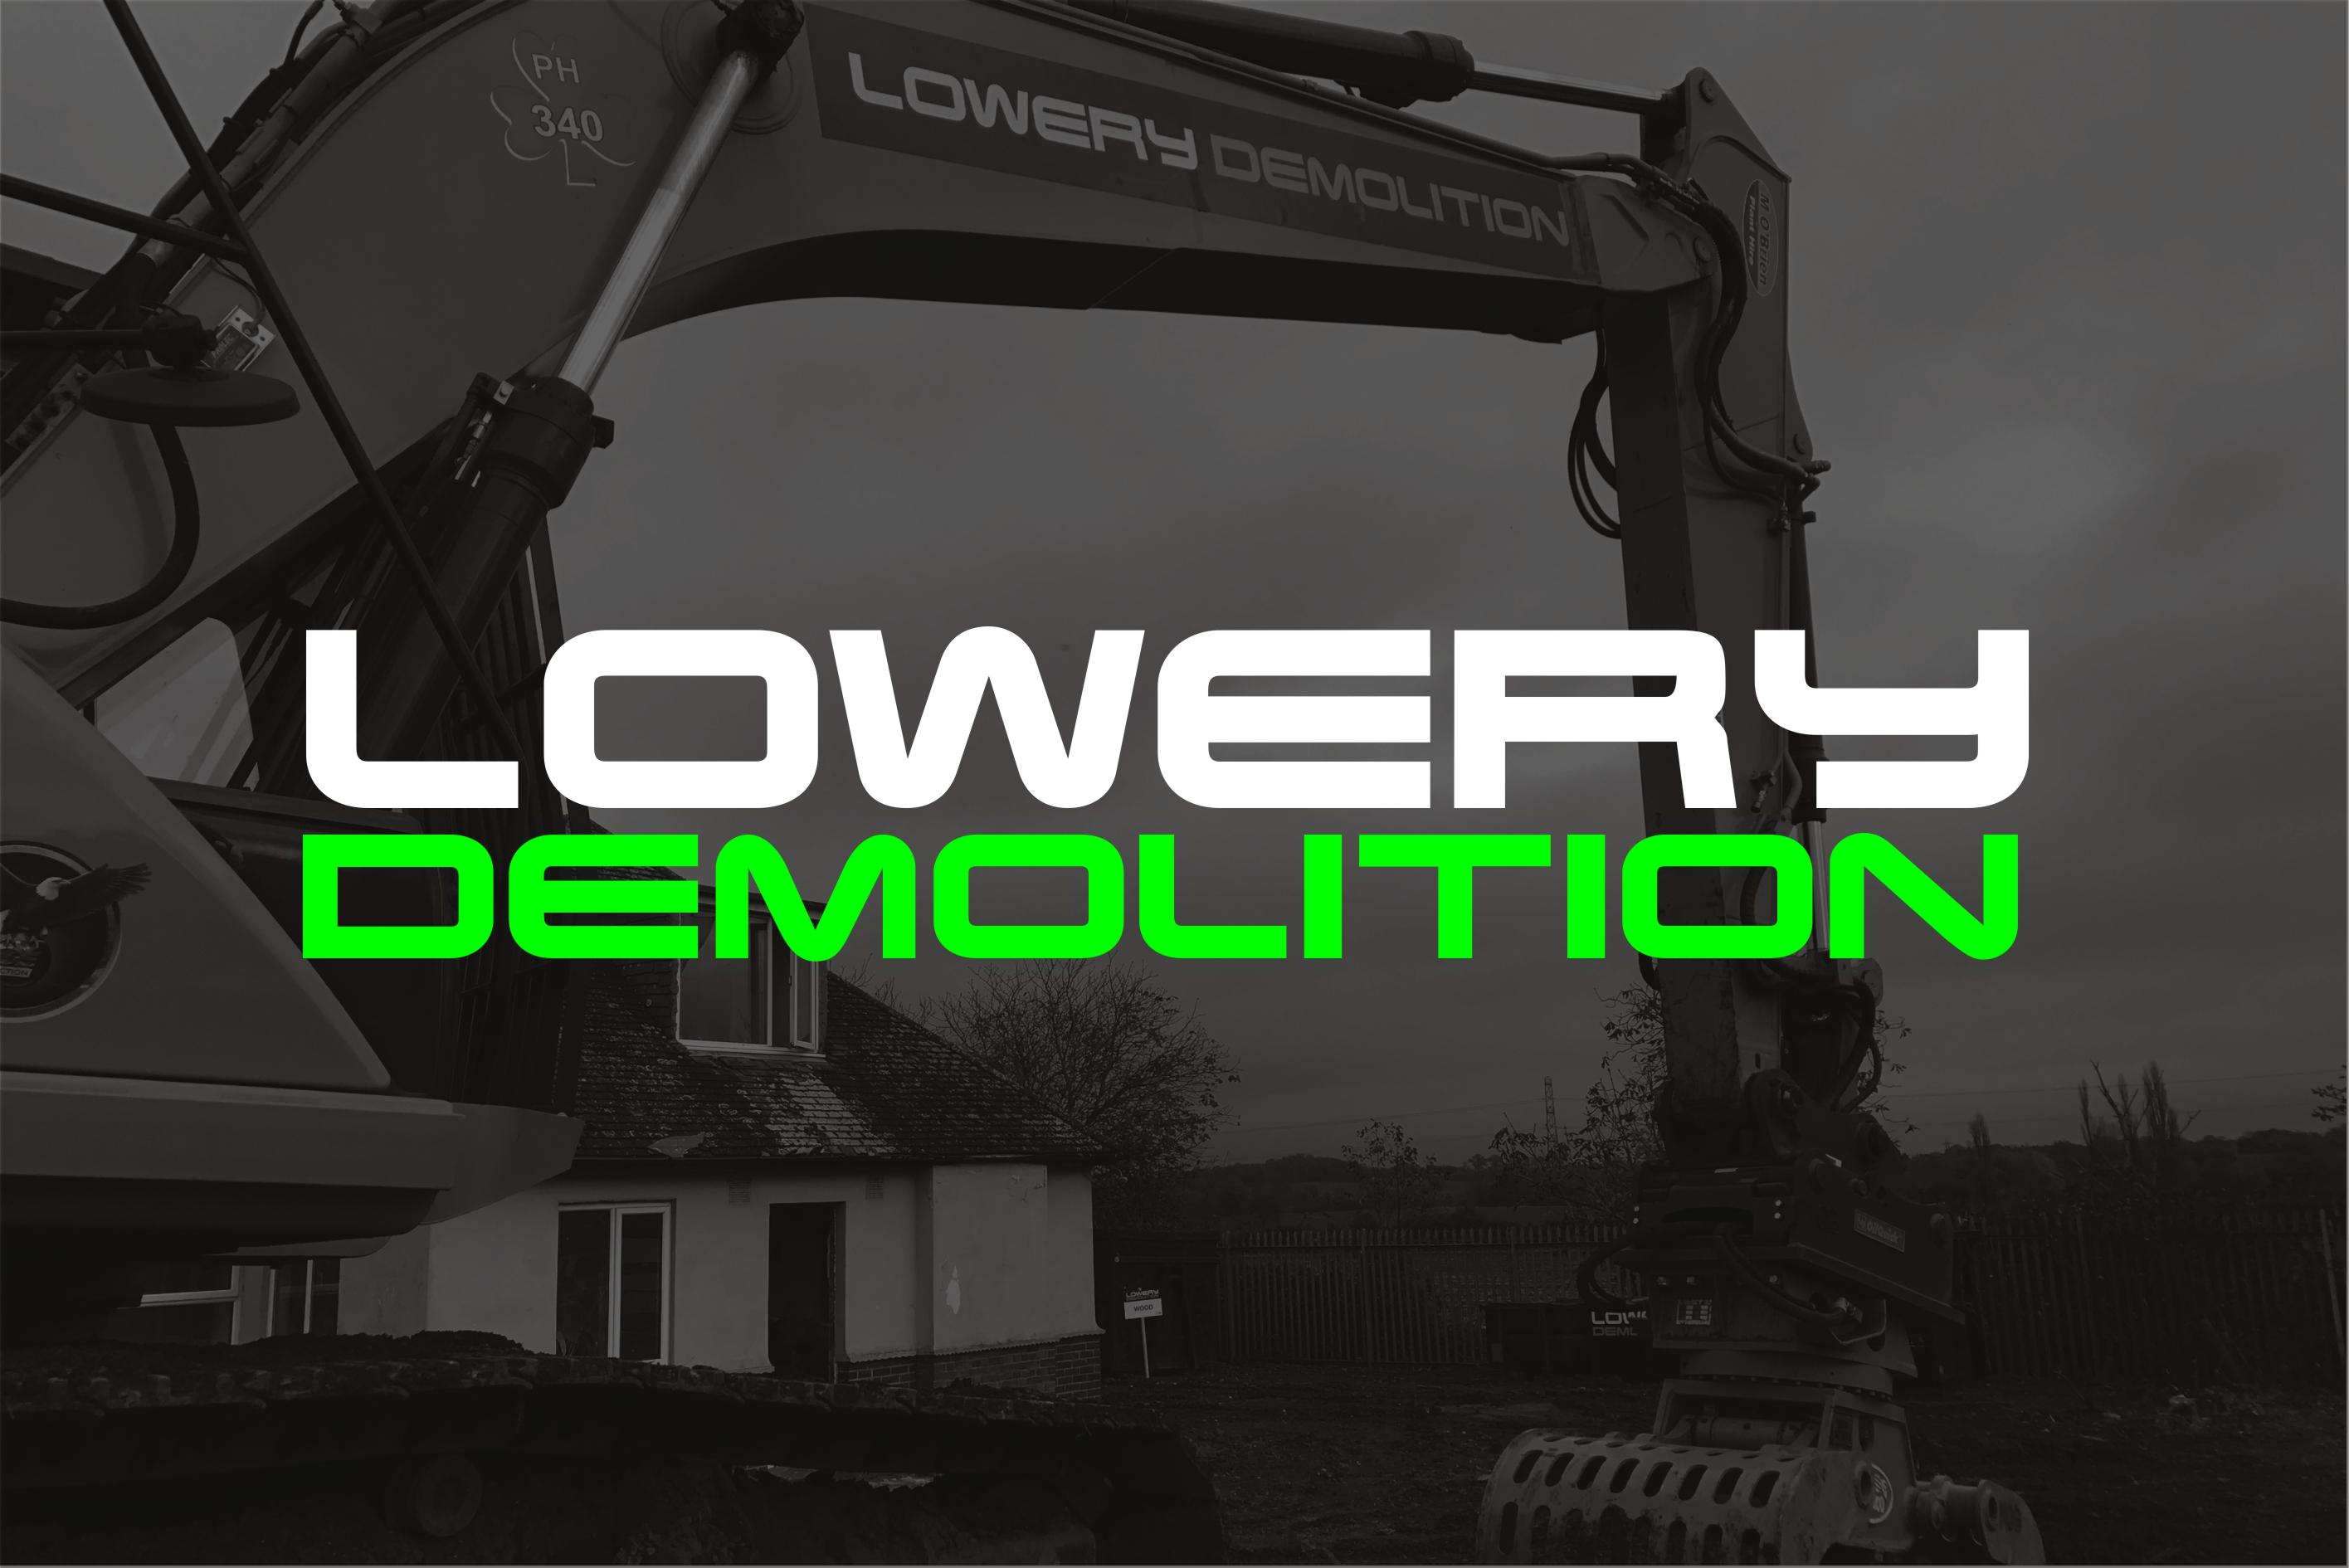 Lowery Demolition